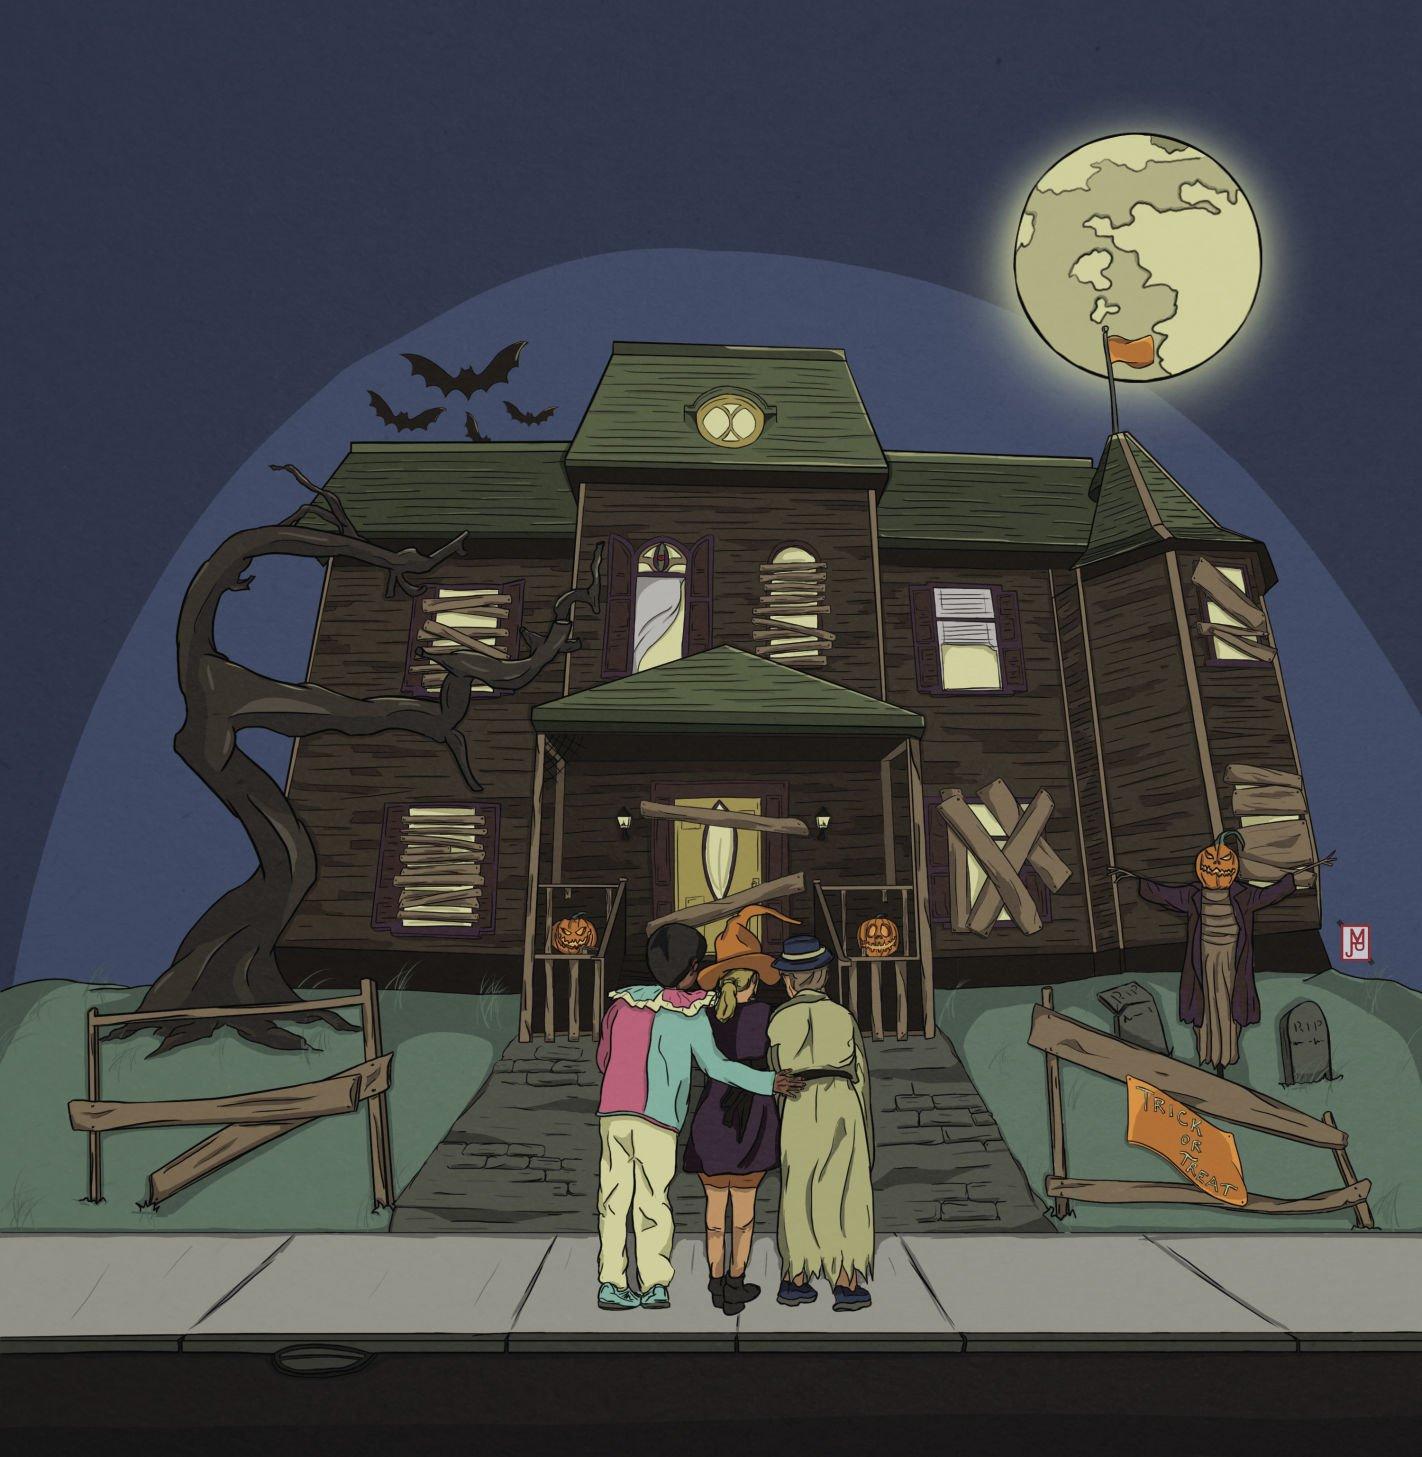 portland phoenix 22 terrifying halloween parties this week rh conwaydailysun com